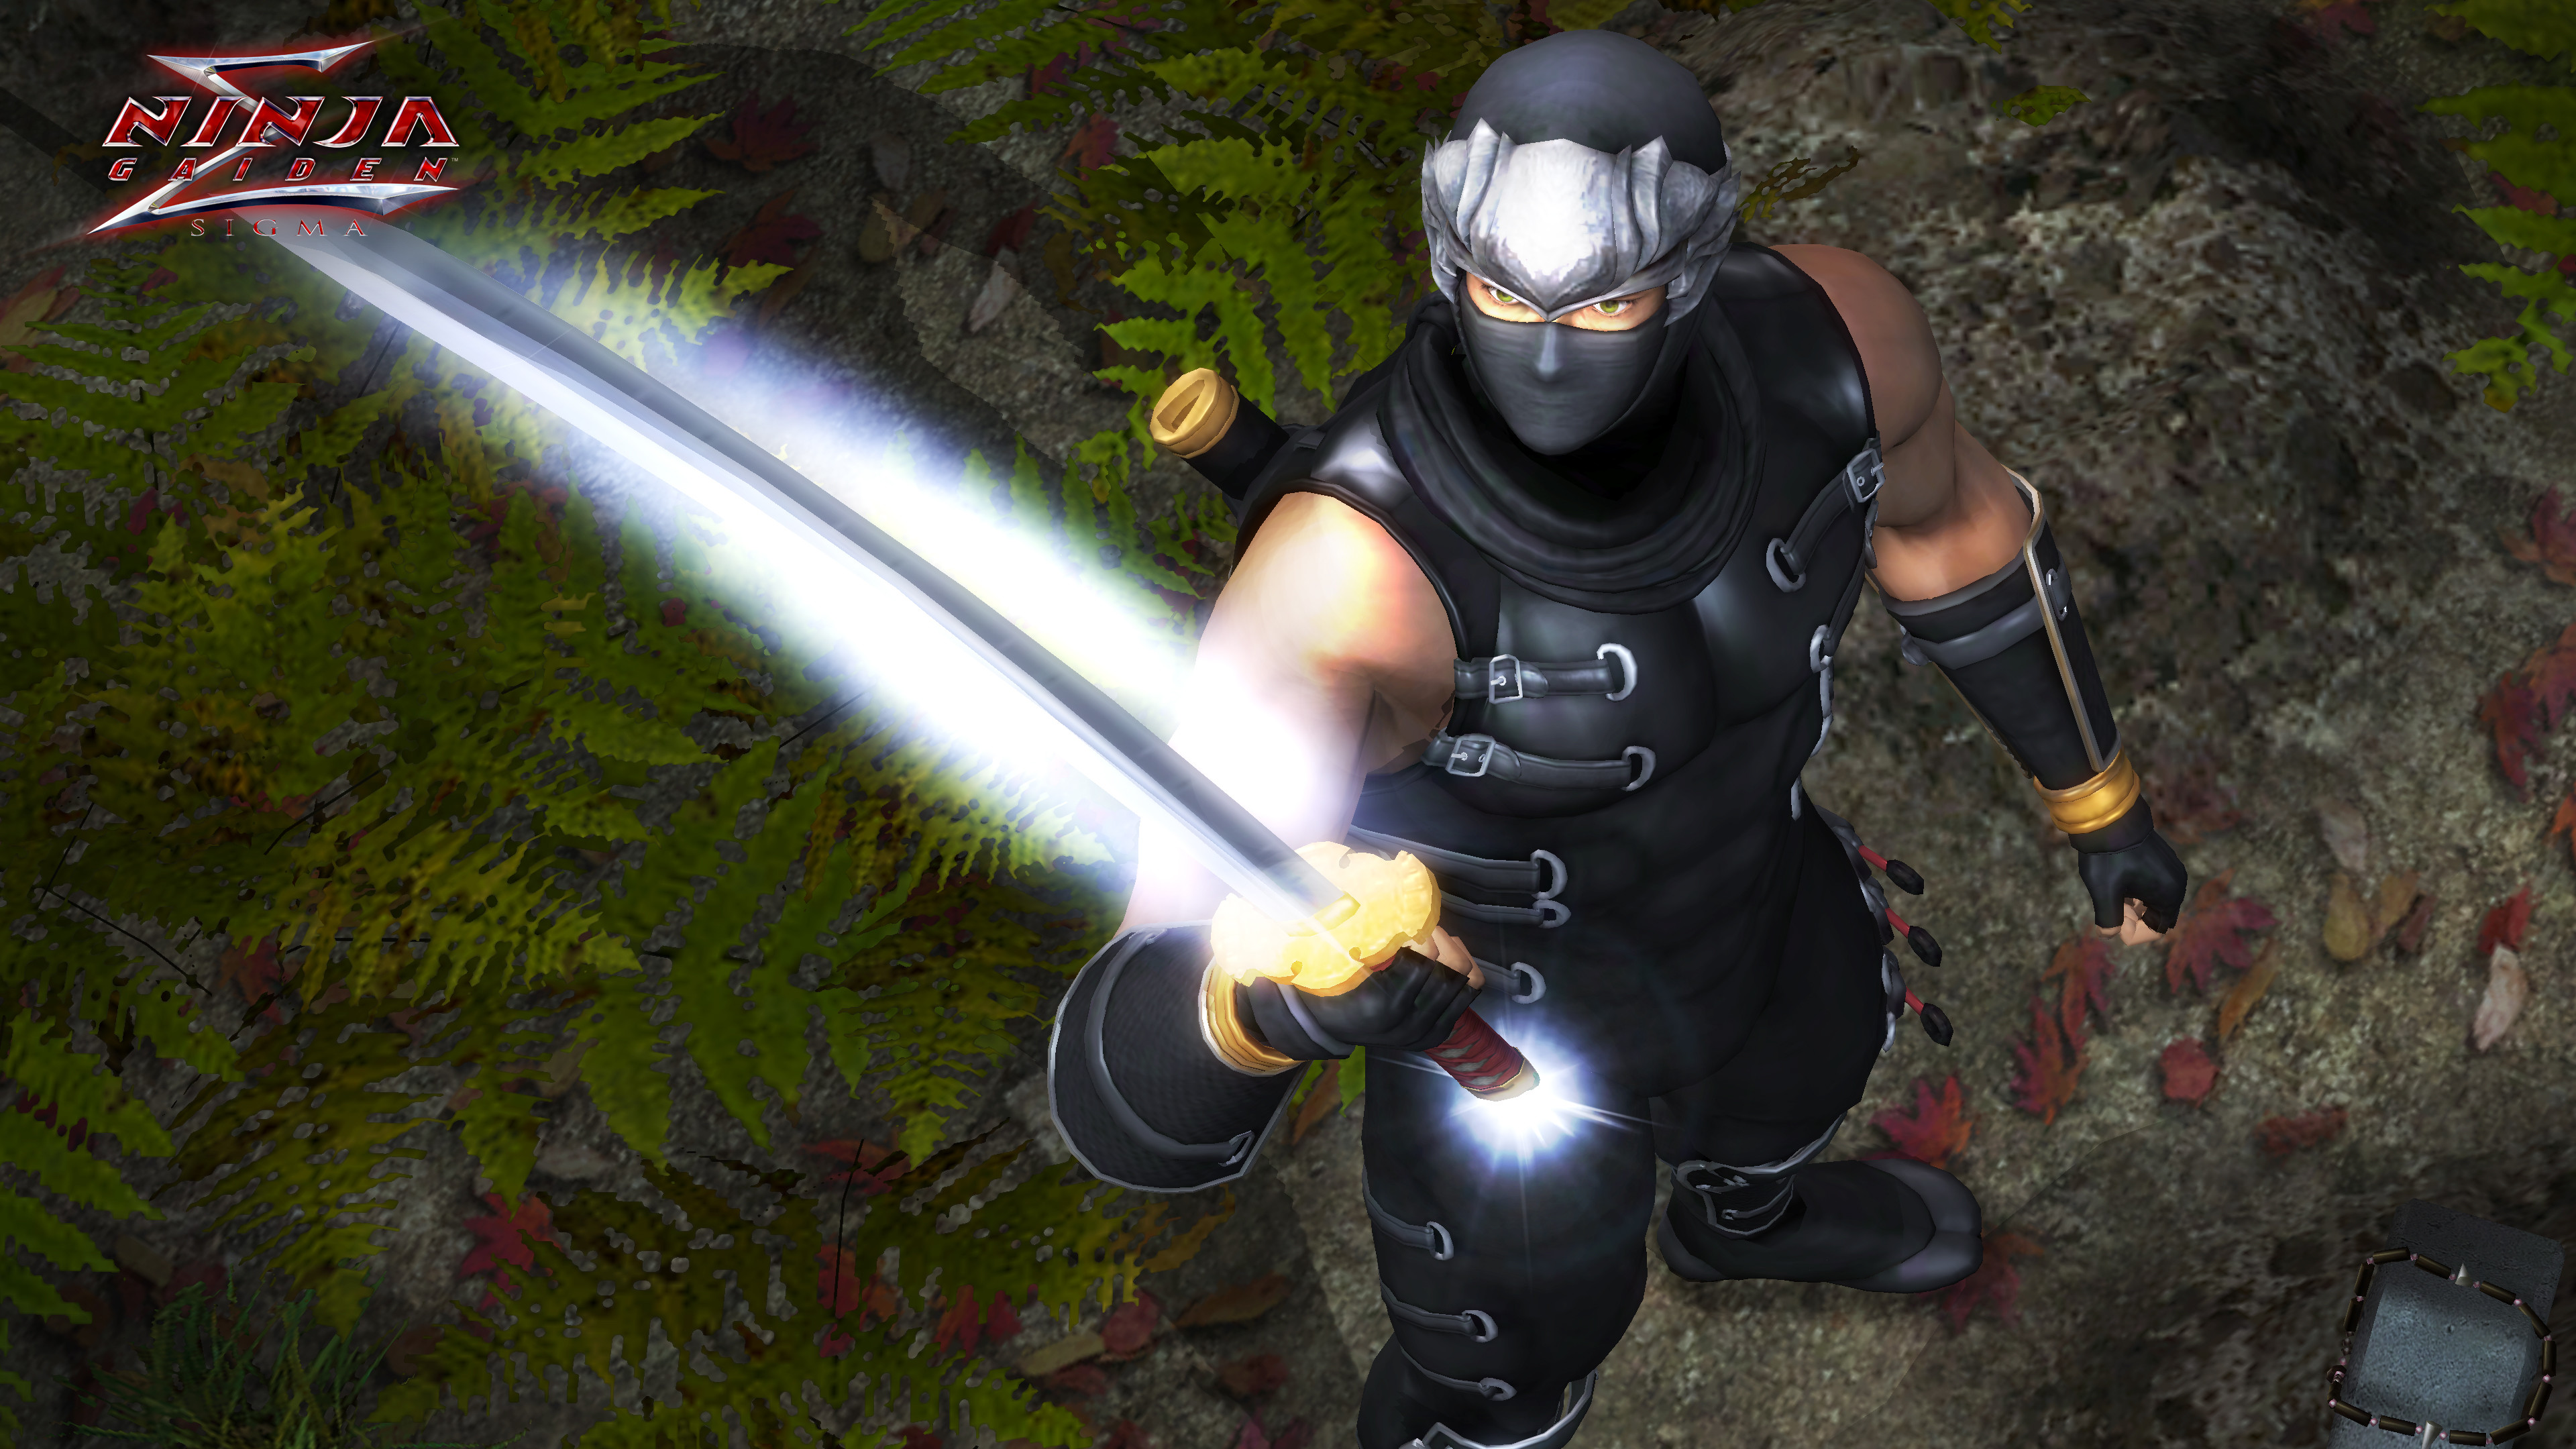 Another screenshot of Ninja Gaiden Sigma 1